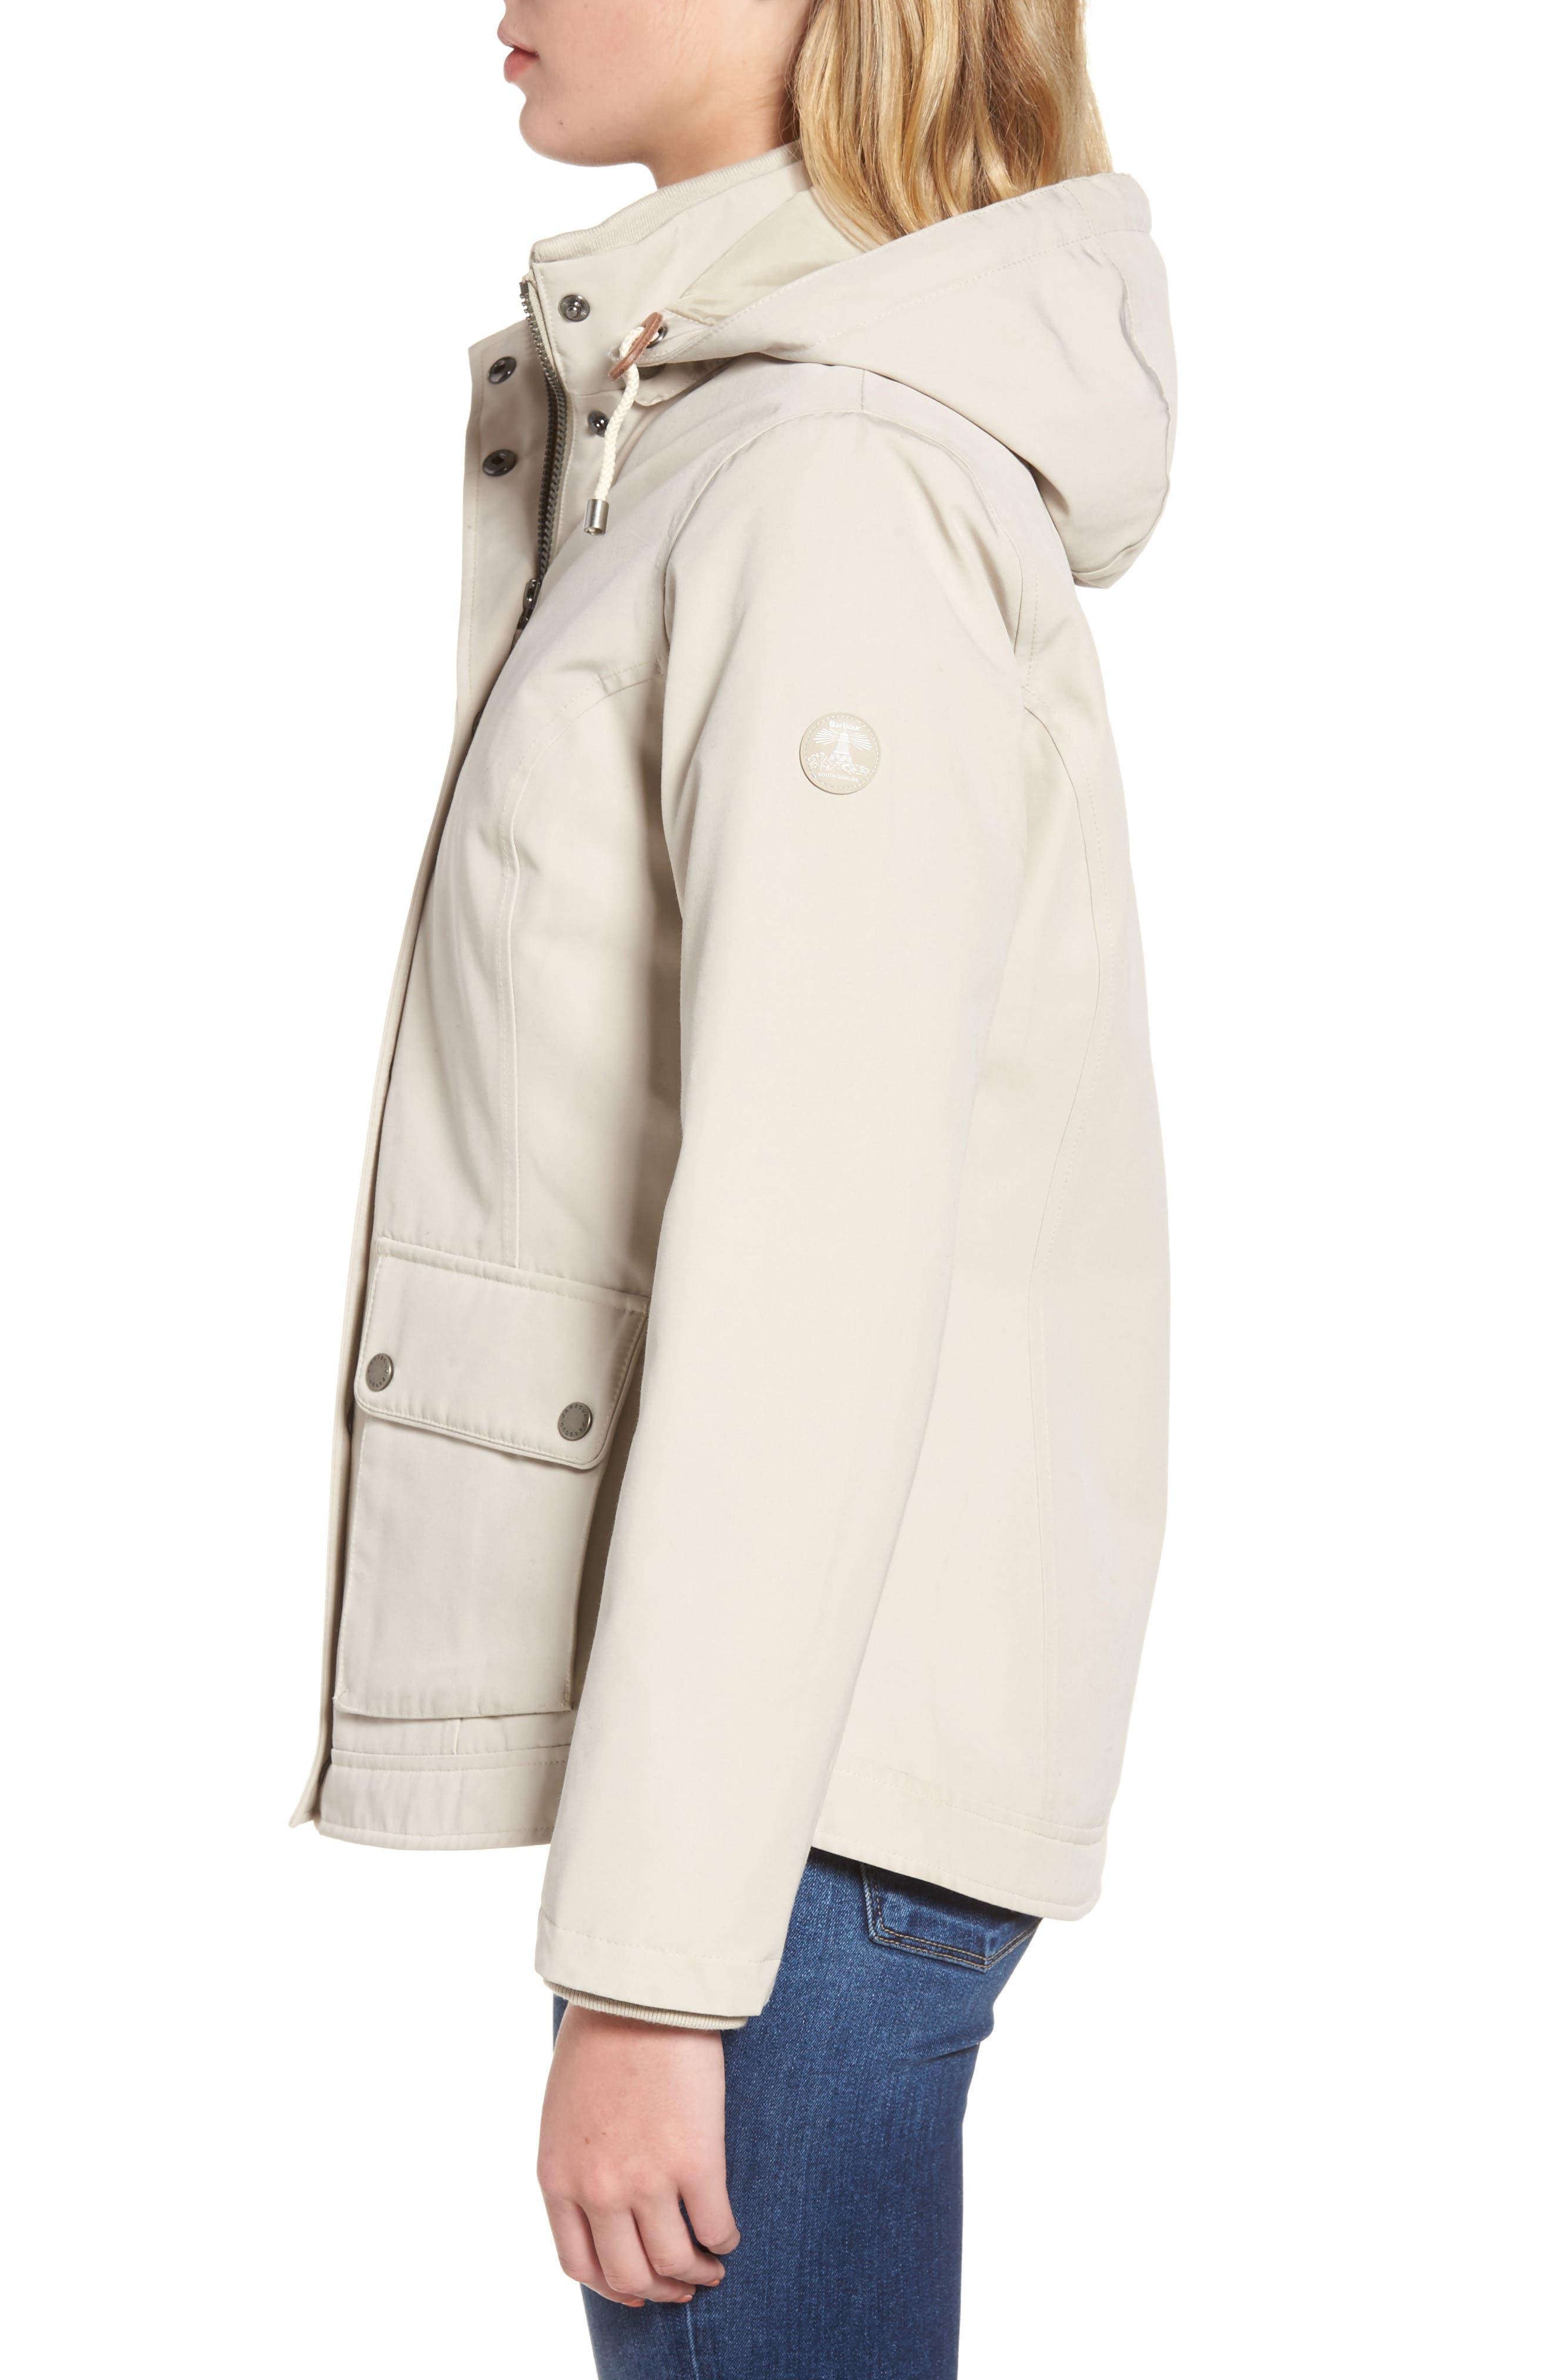 Seaton Hooded Waterproof Jacket,                             Alternate thumbnail 4, color,                             Mist